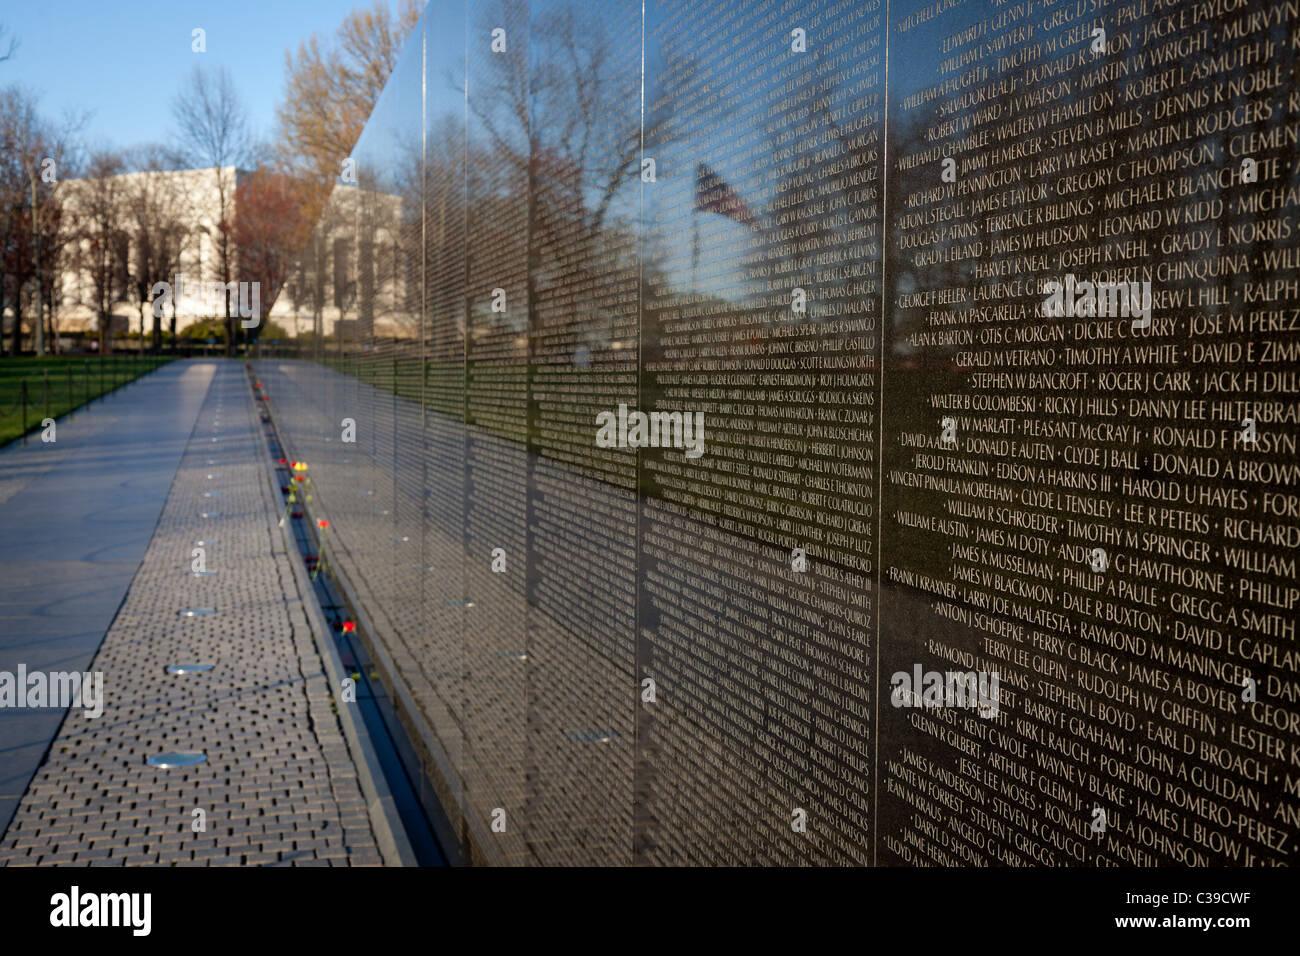 The Vietnam Veterans Memorial in Washington, DC - Stock Image